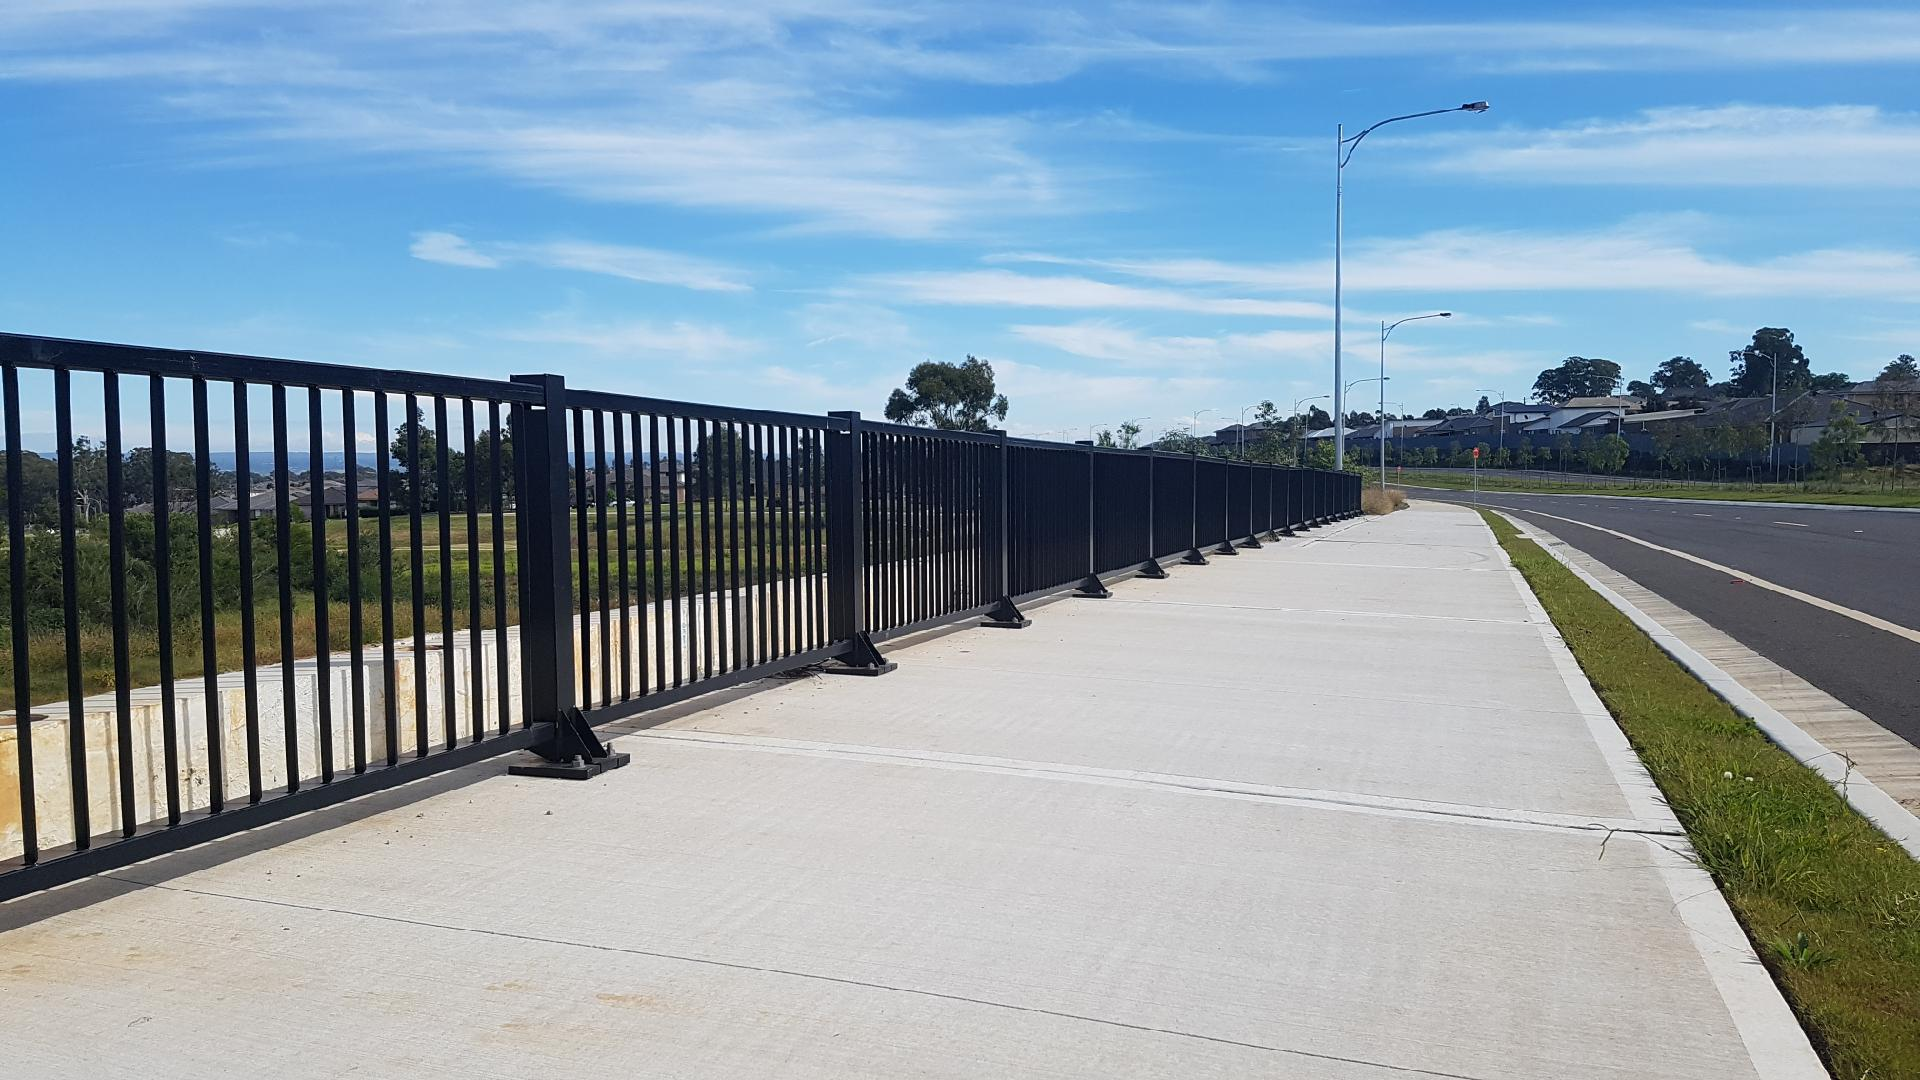 bridge pedestrian pathway fall protection with rhino stop elite